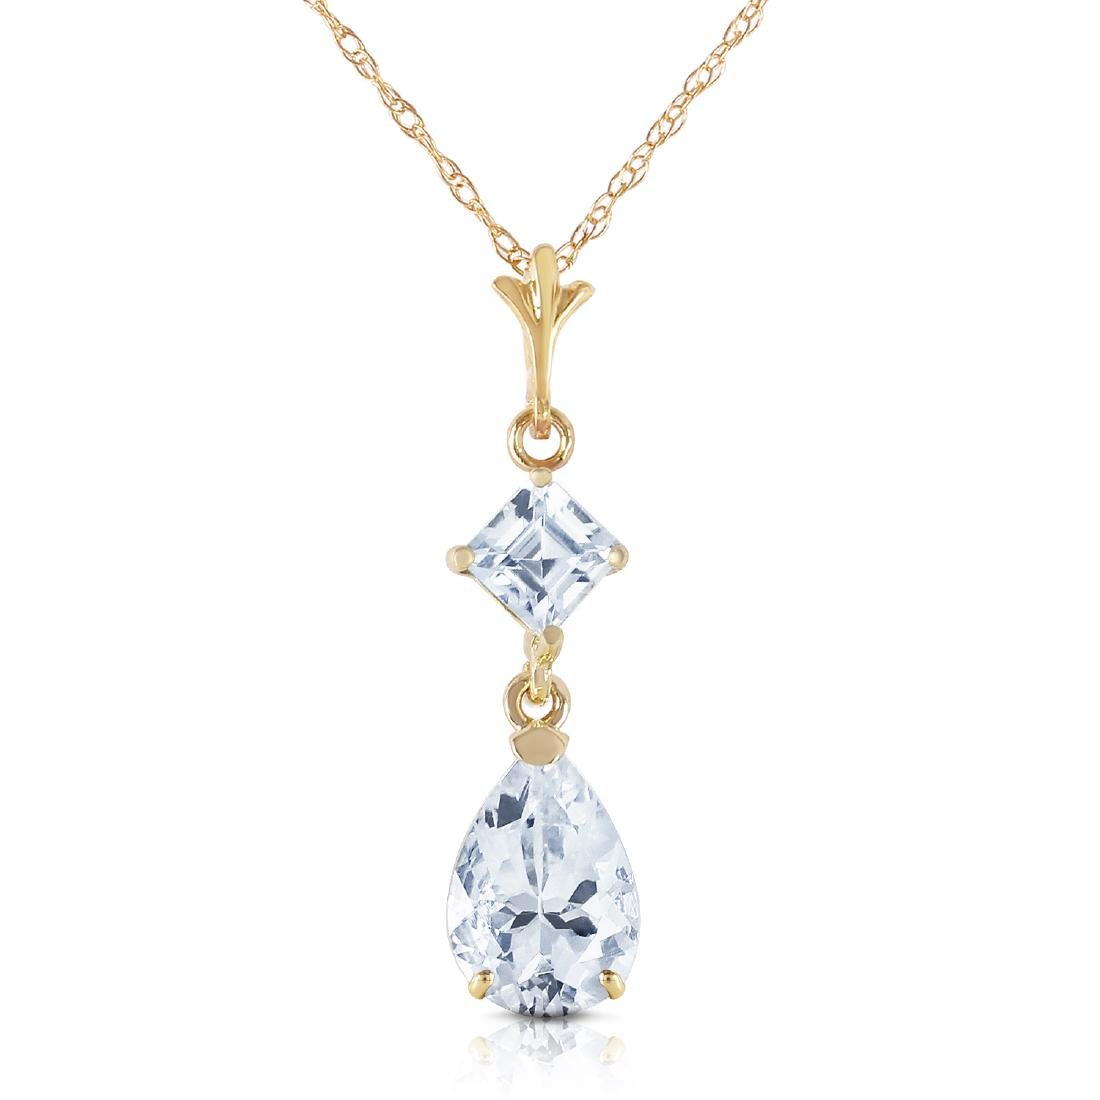 Genuine 2 ctw Aquamarine Necklace Jewelry 14KT Yellow